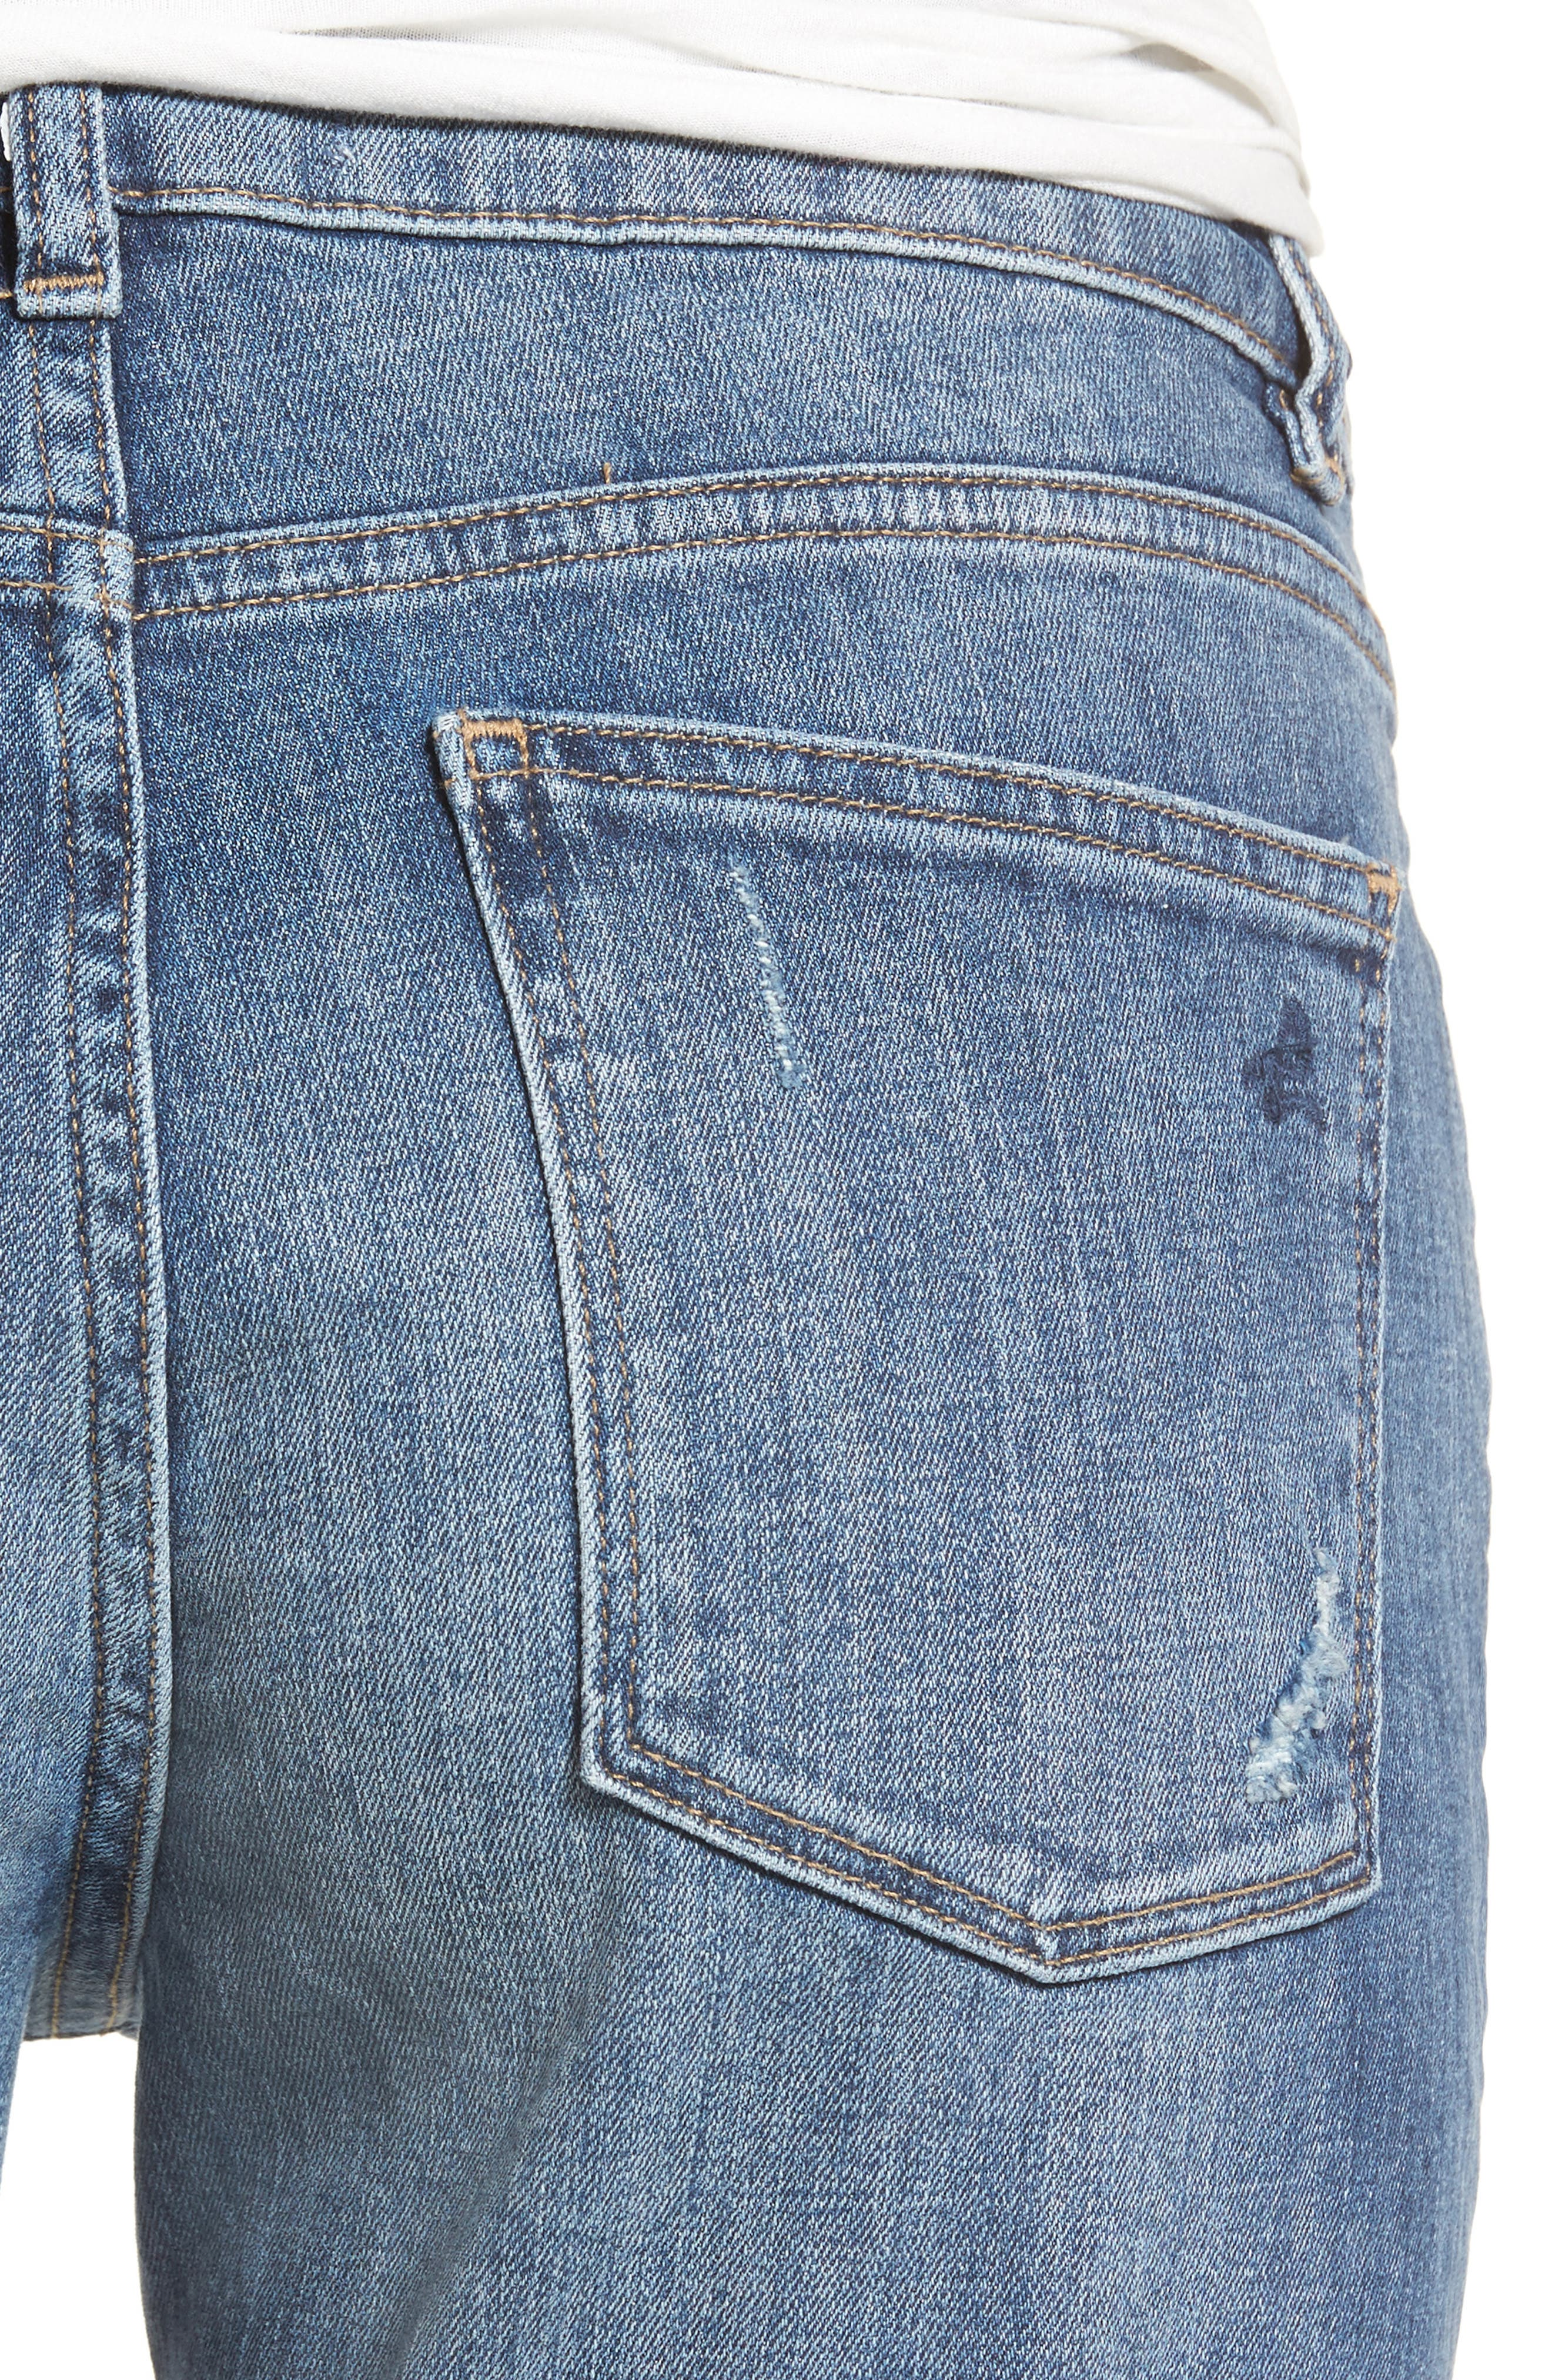 Davis Ankle Girlfriend Jeans,                             Alternate thumbnail 4, color,                             425